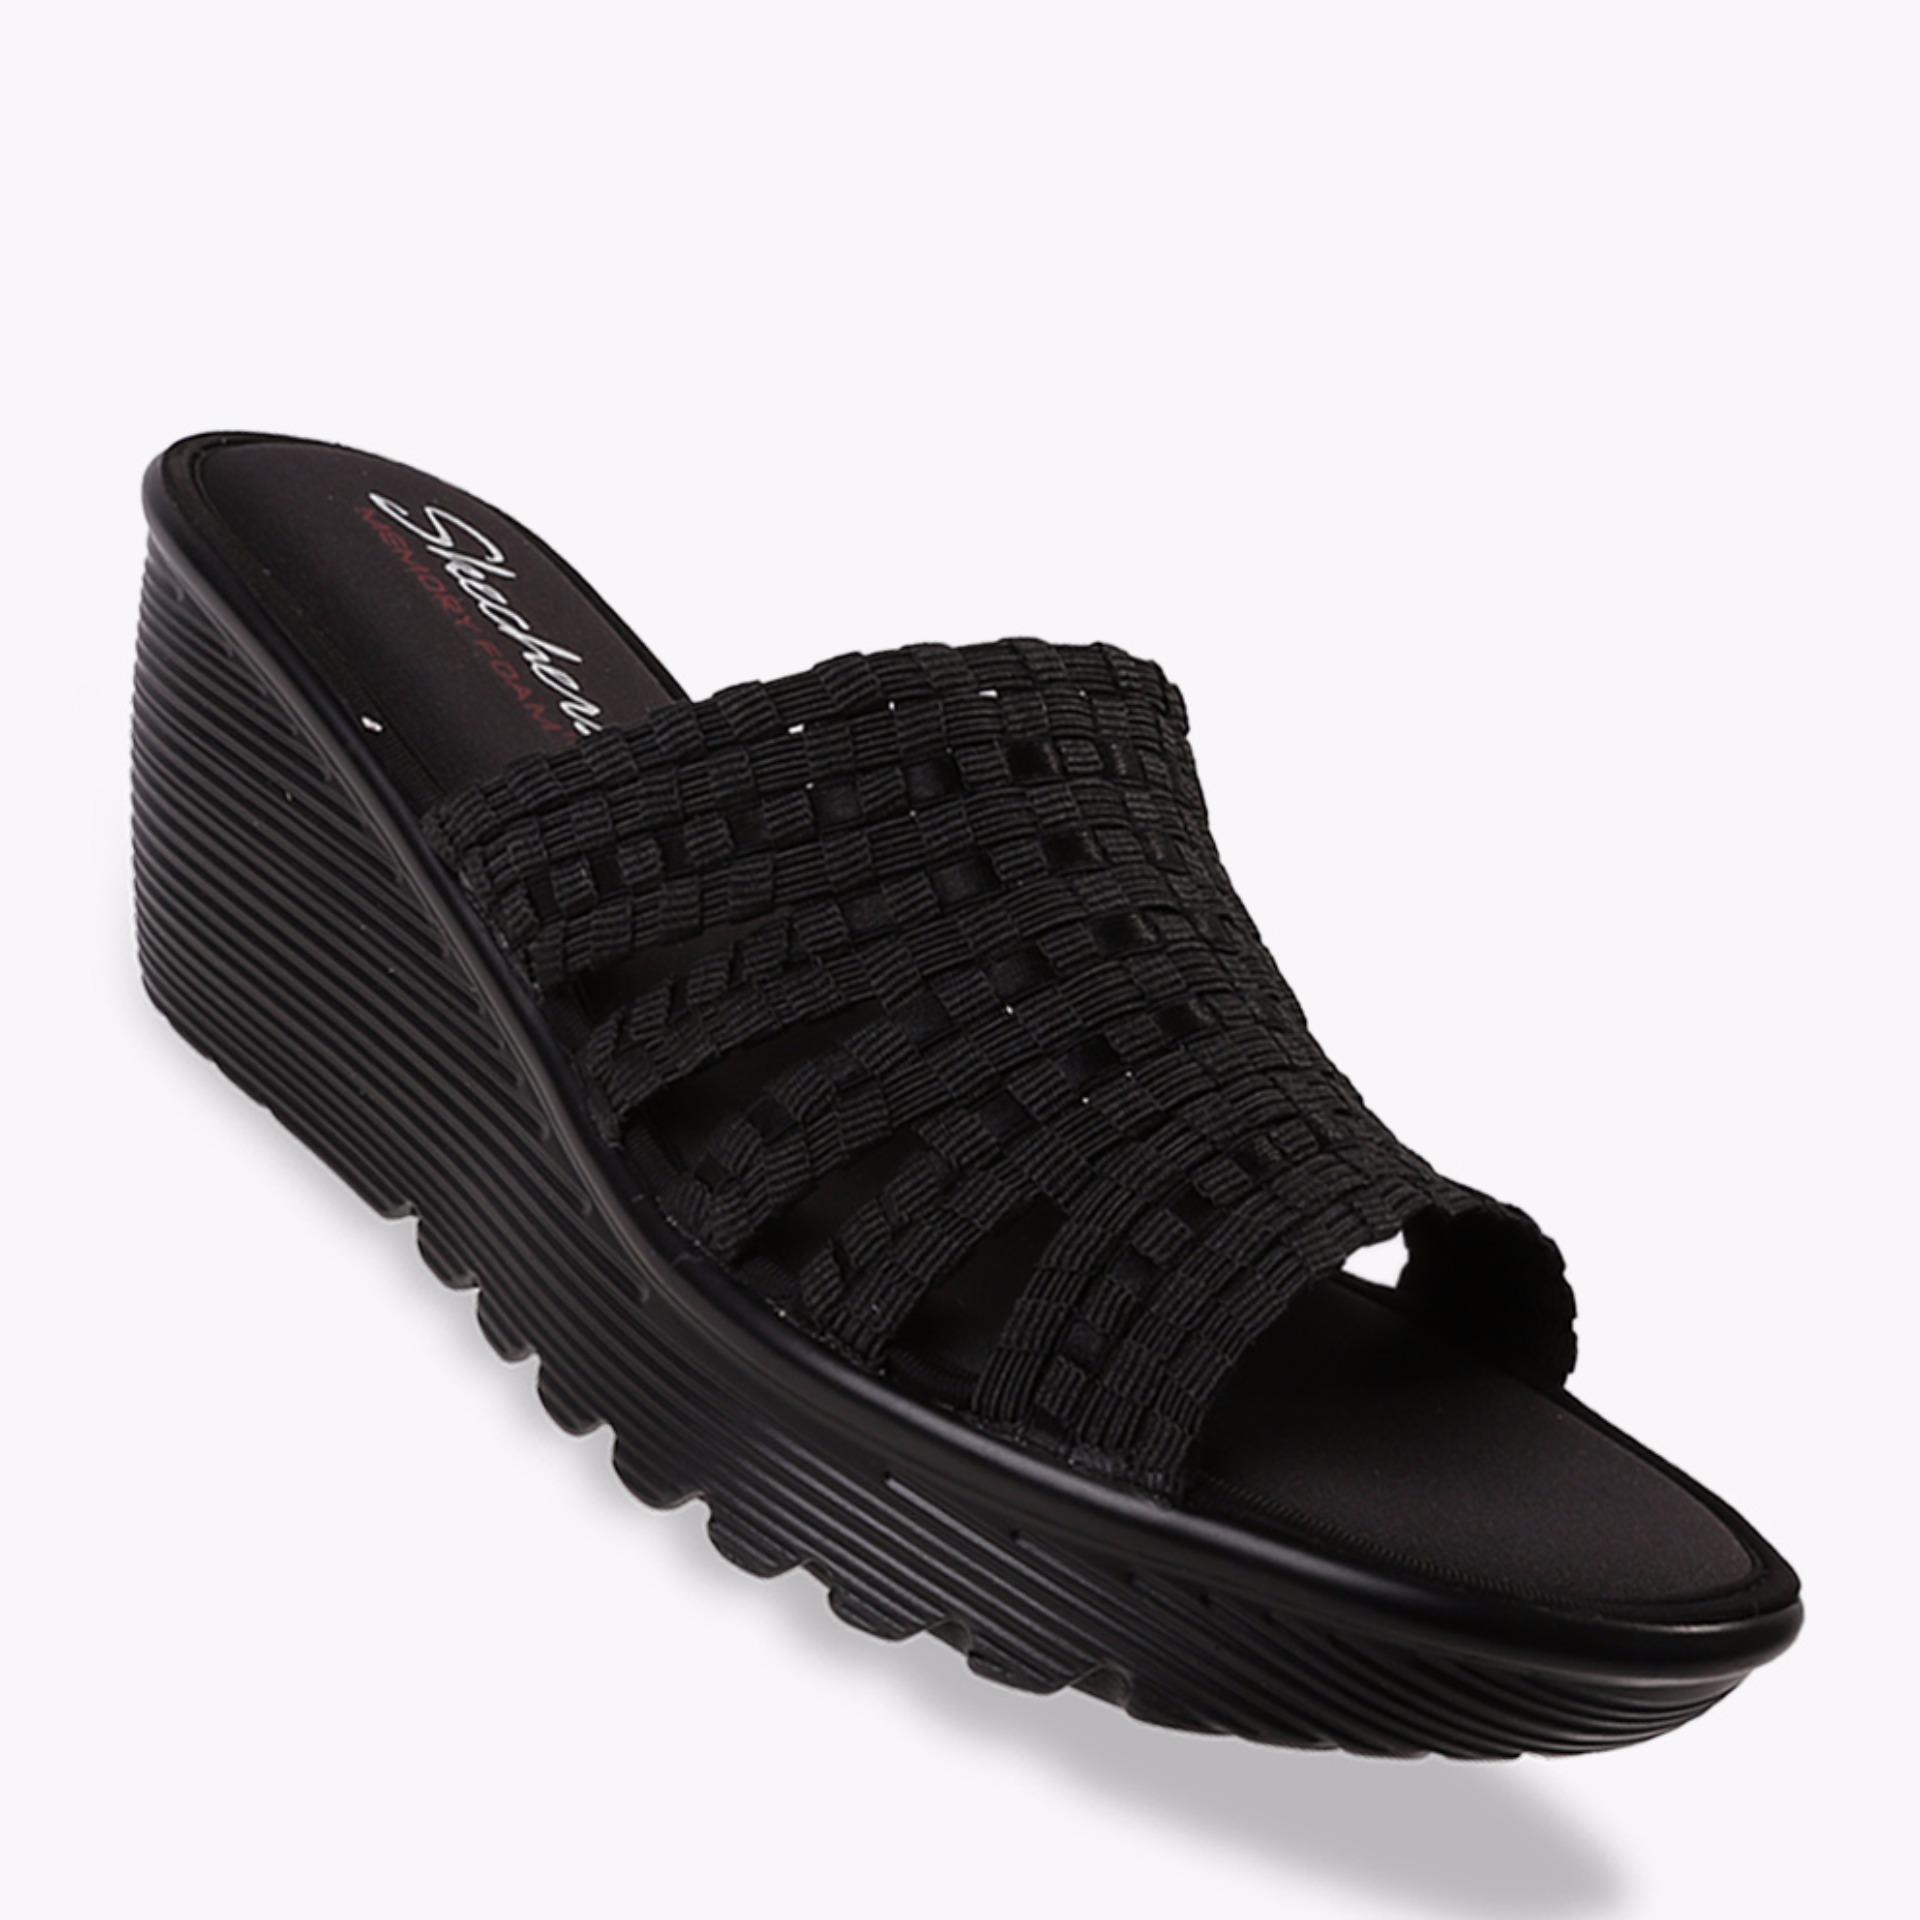 Skechers Parallel - Mornin Stretch Women's Sandals - Hitam